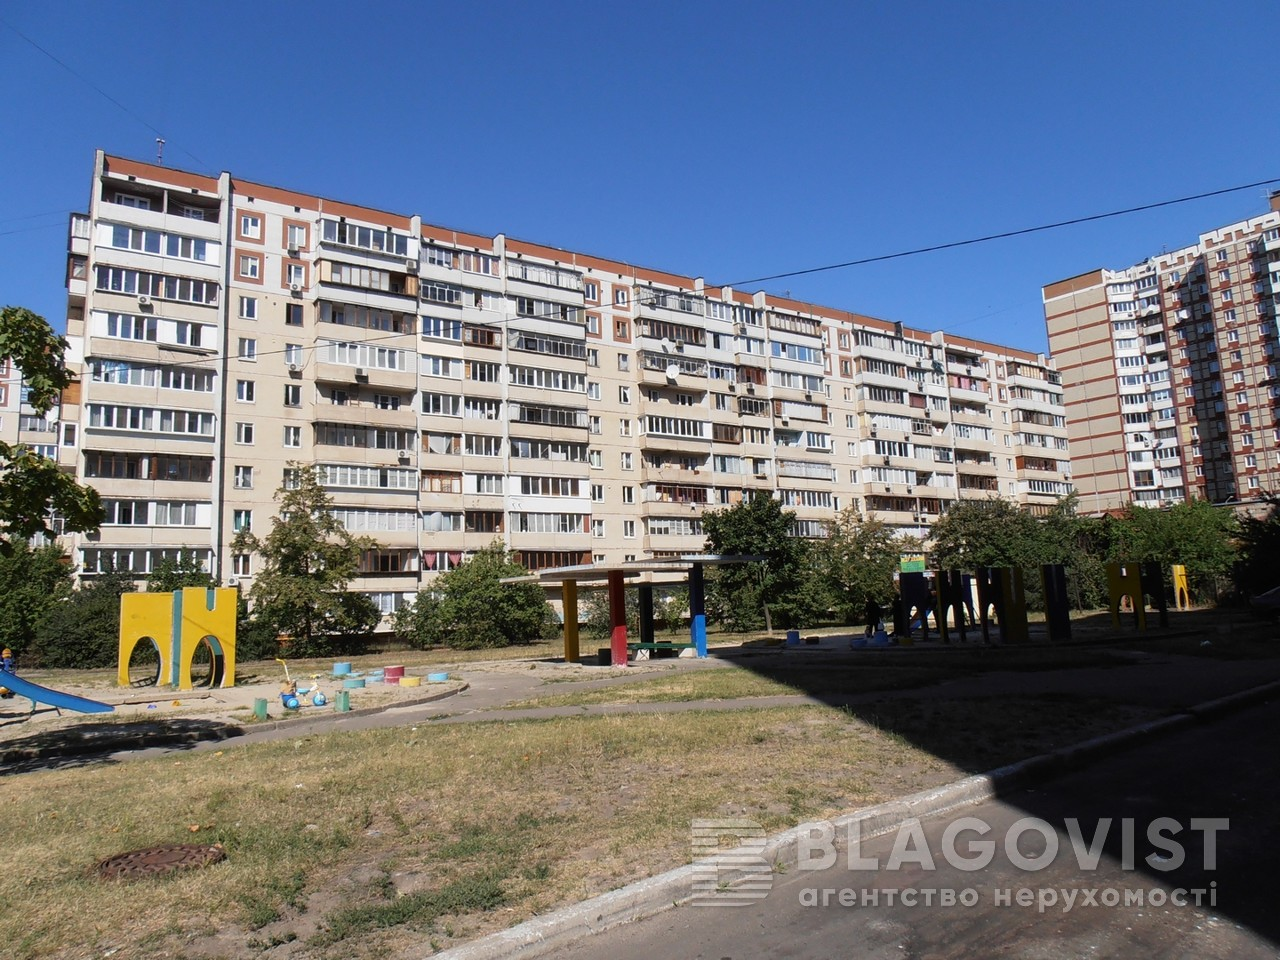 Квартира G-13988, Маяковского Владимира просп., 69а, Киев - Фото 3